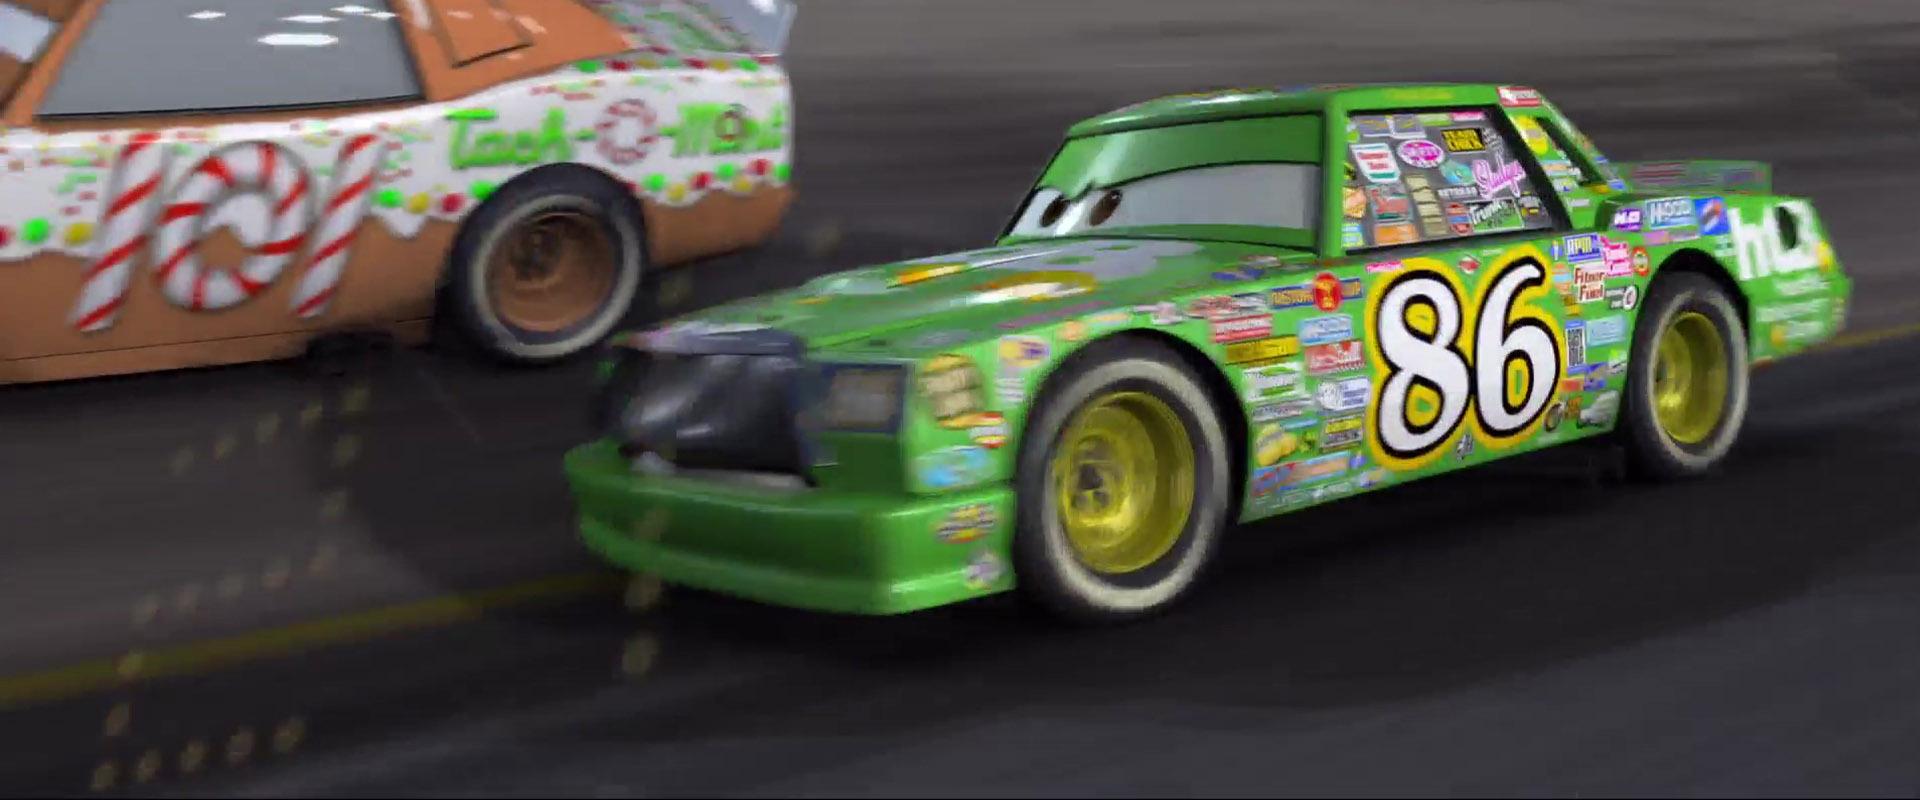 greg candyman personnage character pixar disney cars